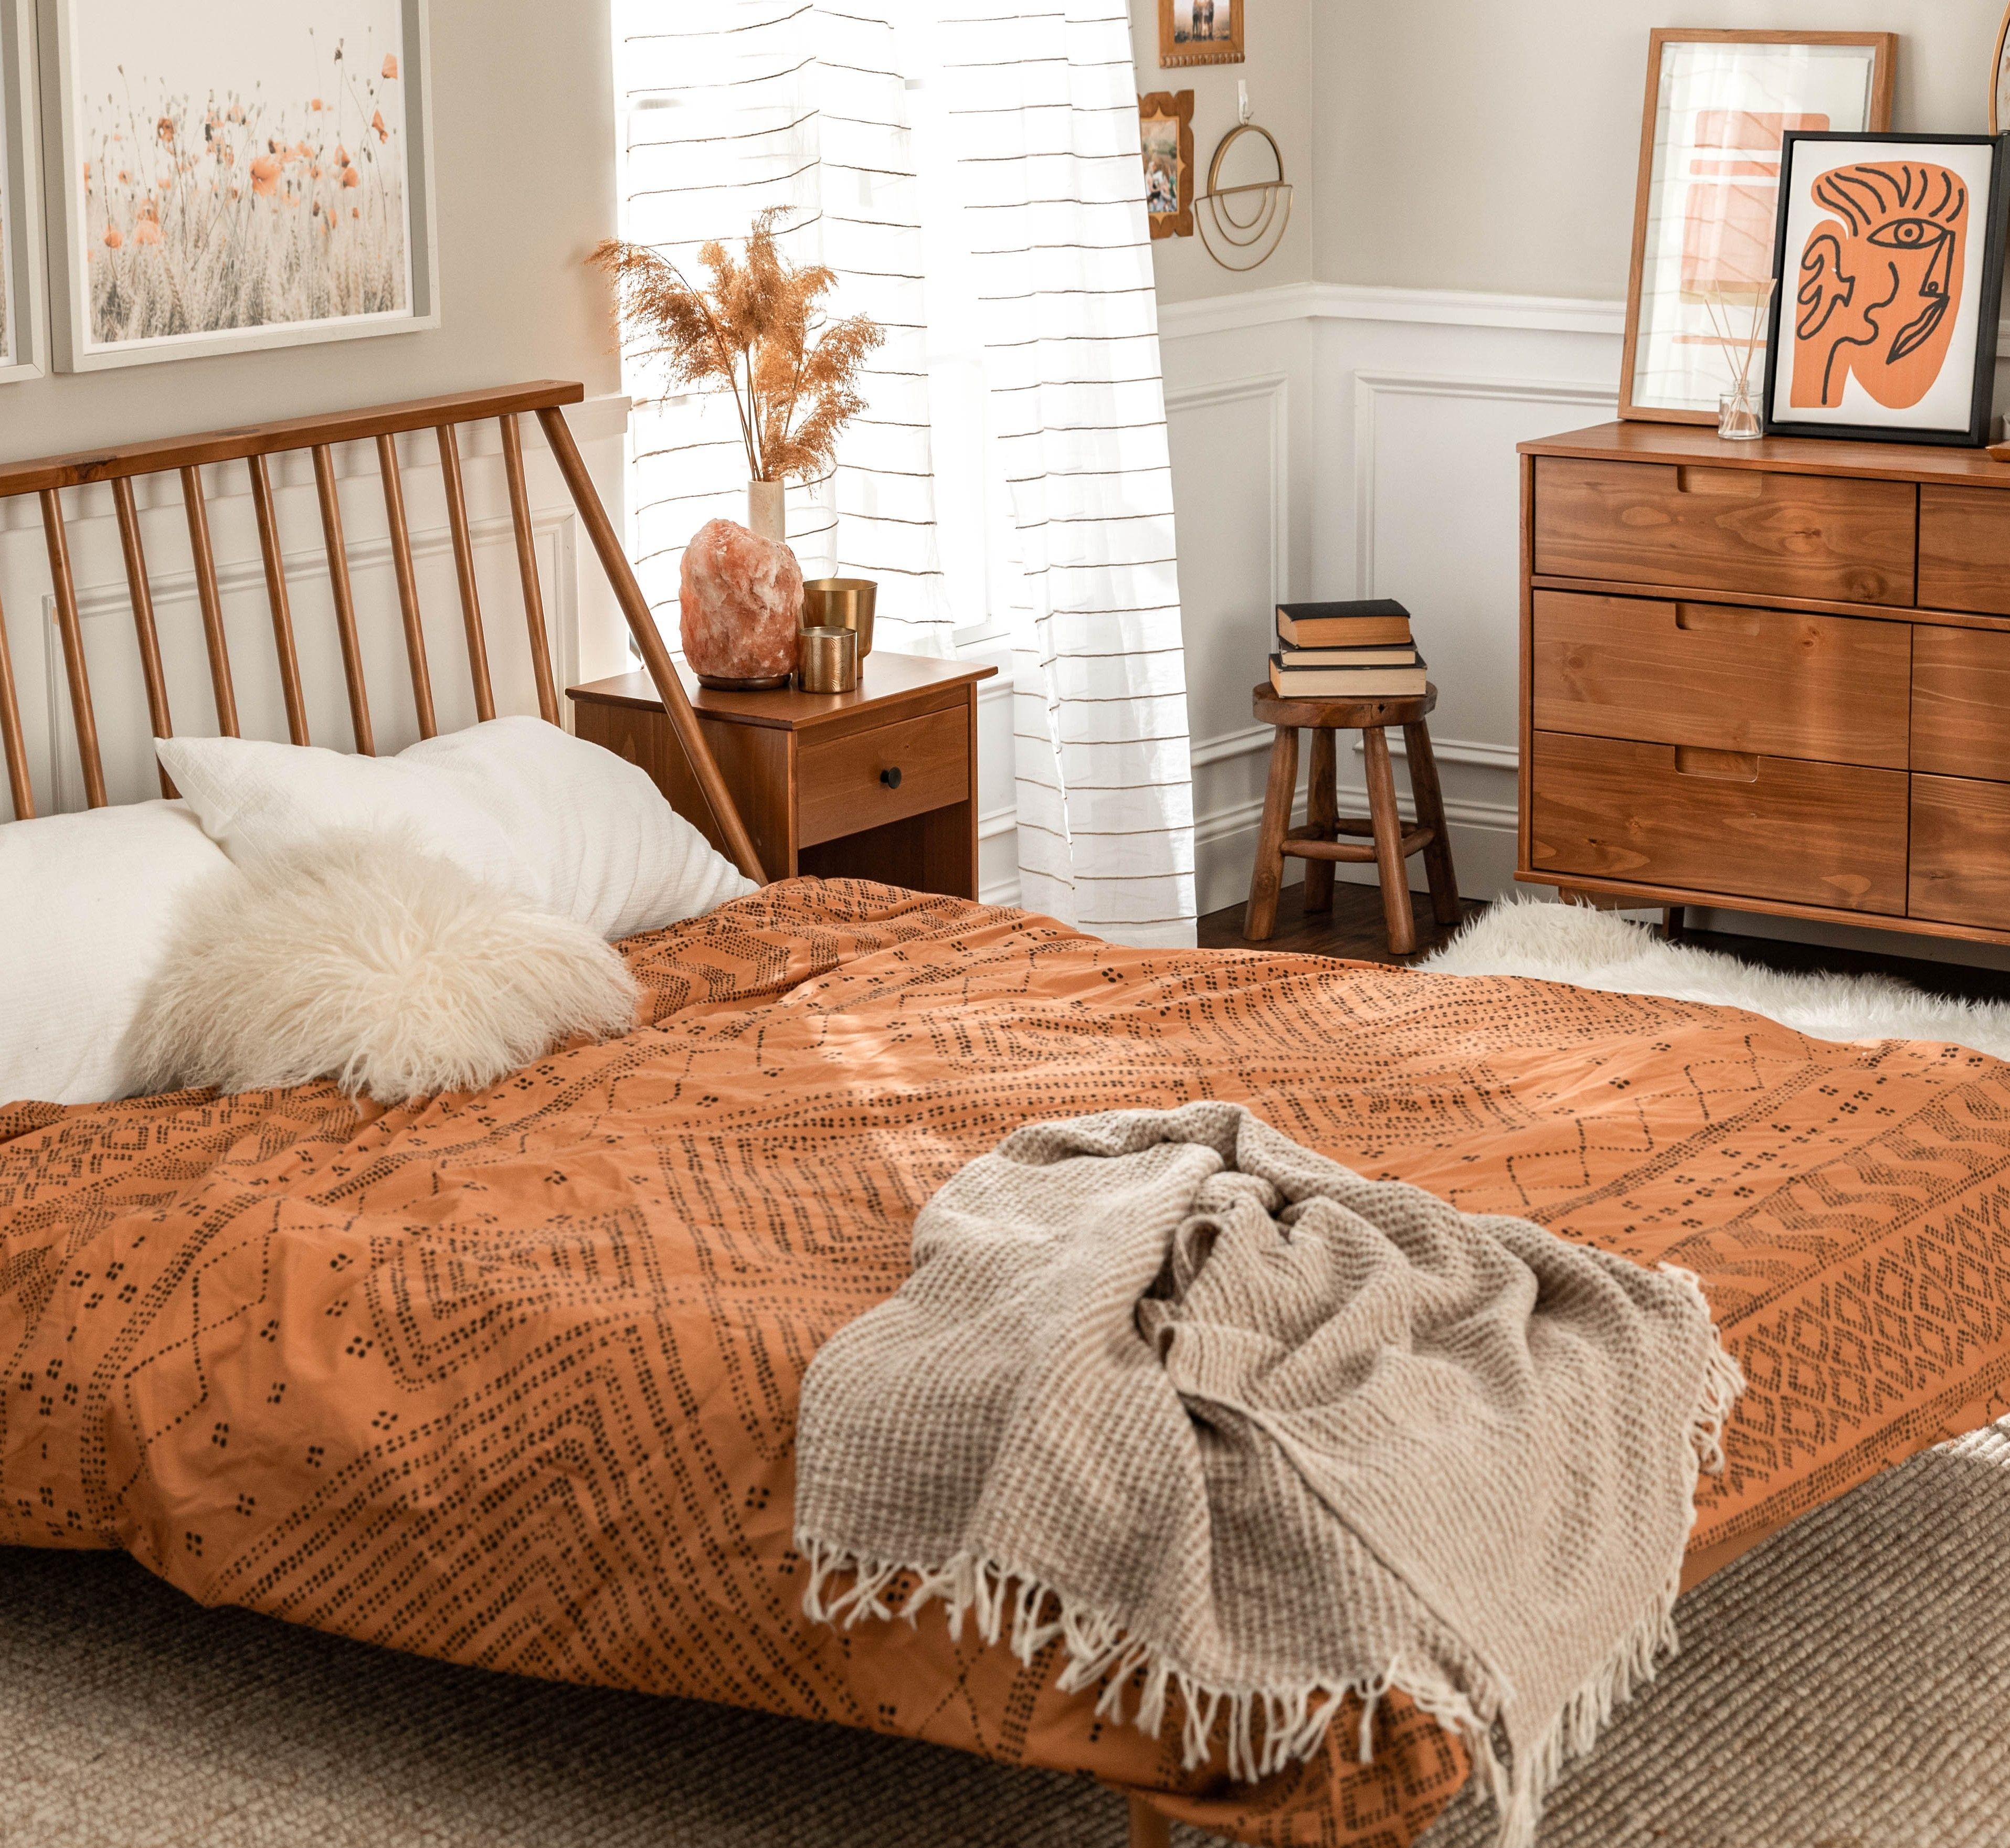 Spindle Back Solid Wood Queen Bed Wood Tones Edition Home Decor Bedroom Bedroom Bed Design Orange Bedroom Decor Fresh orange bedroom designs